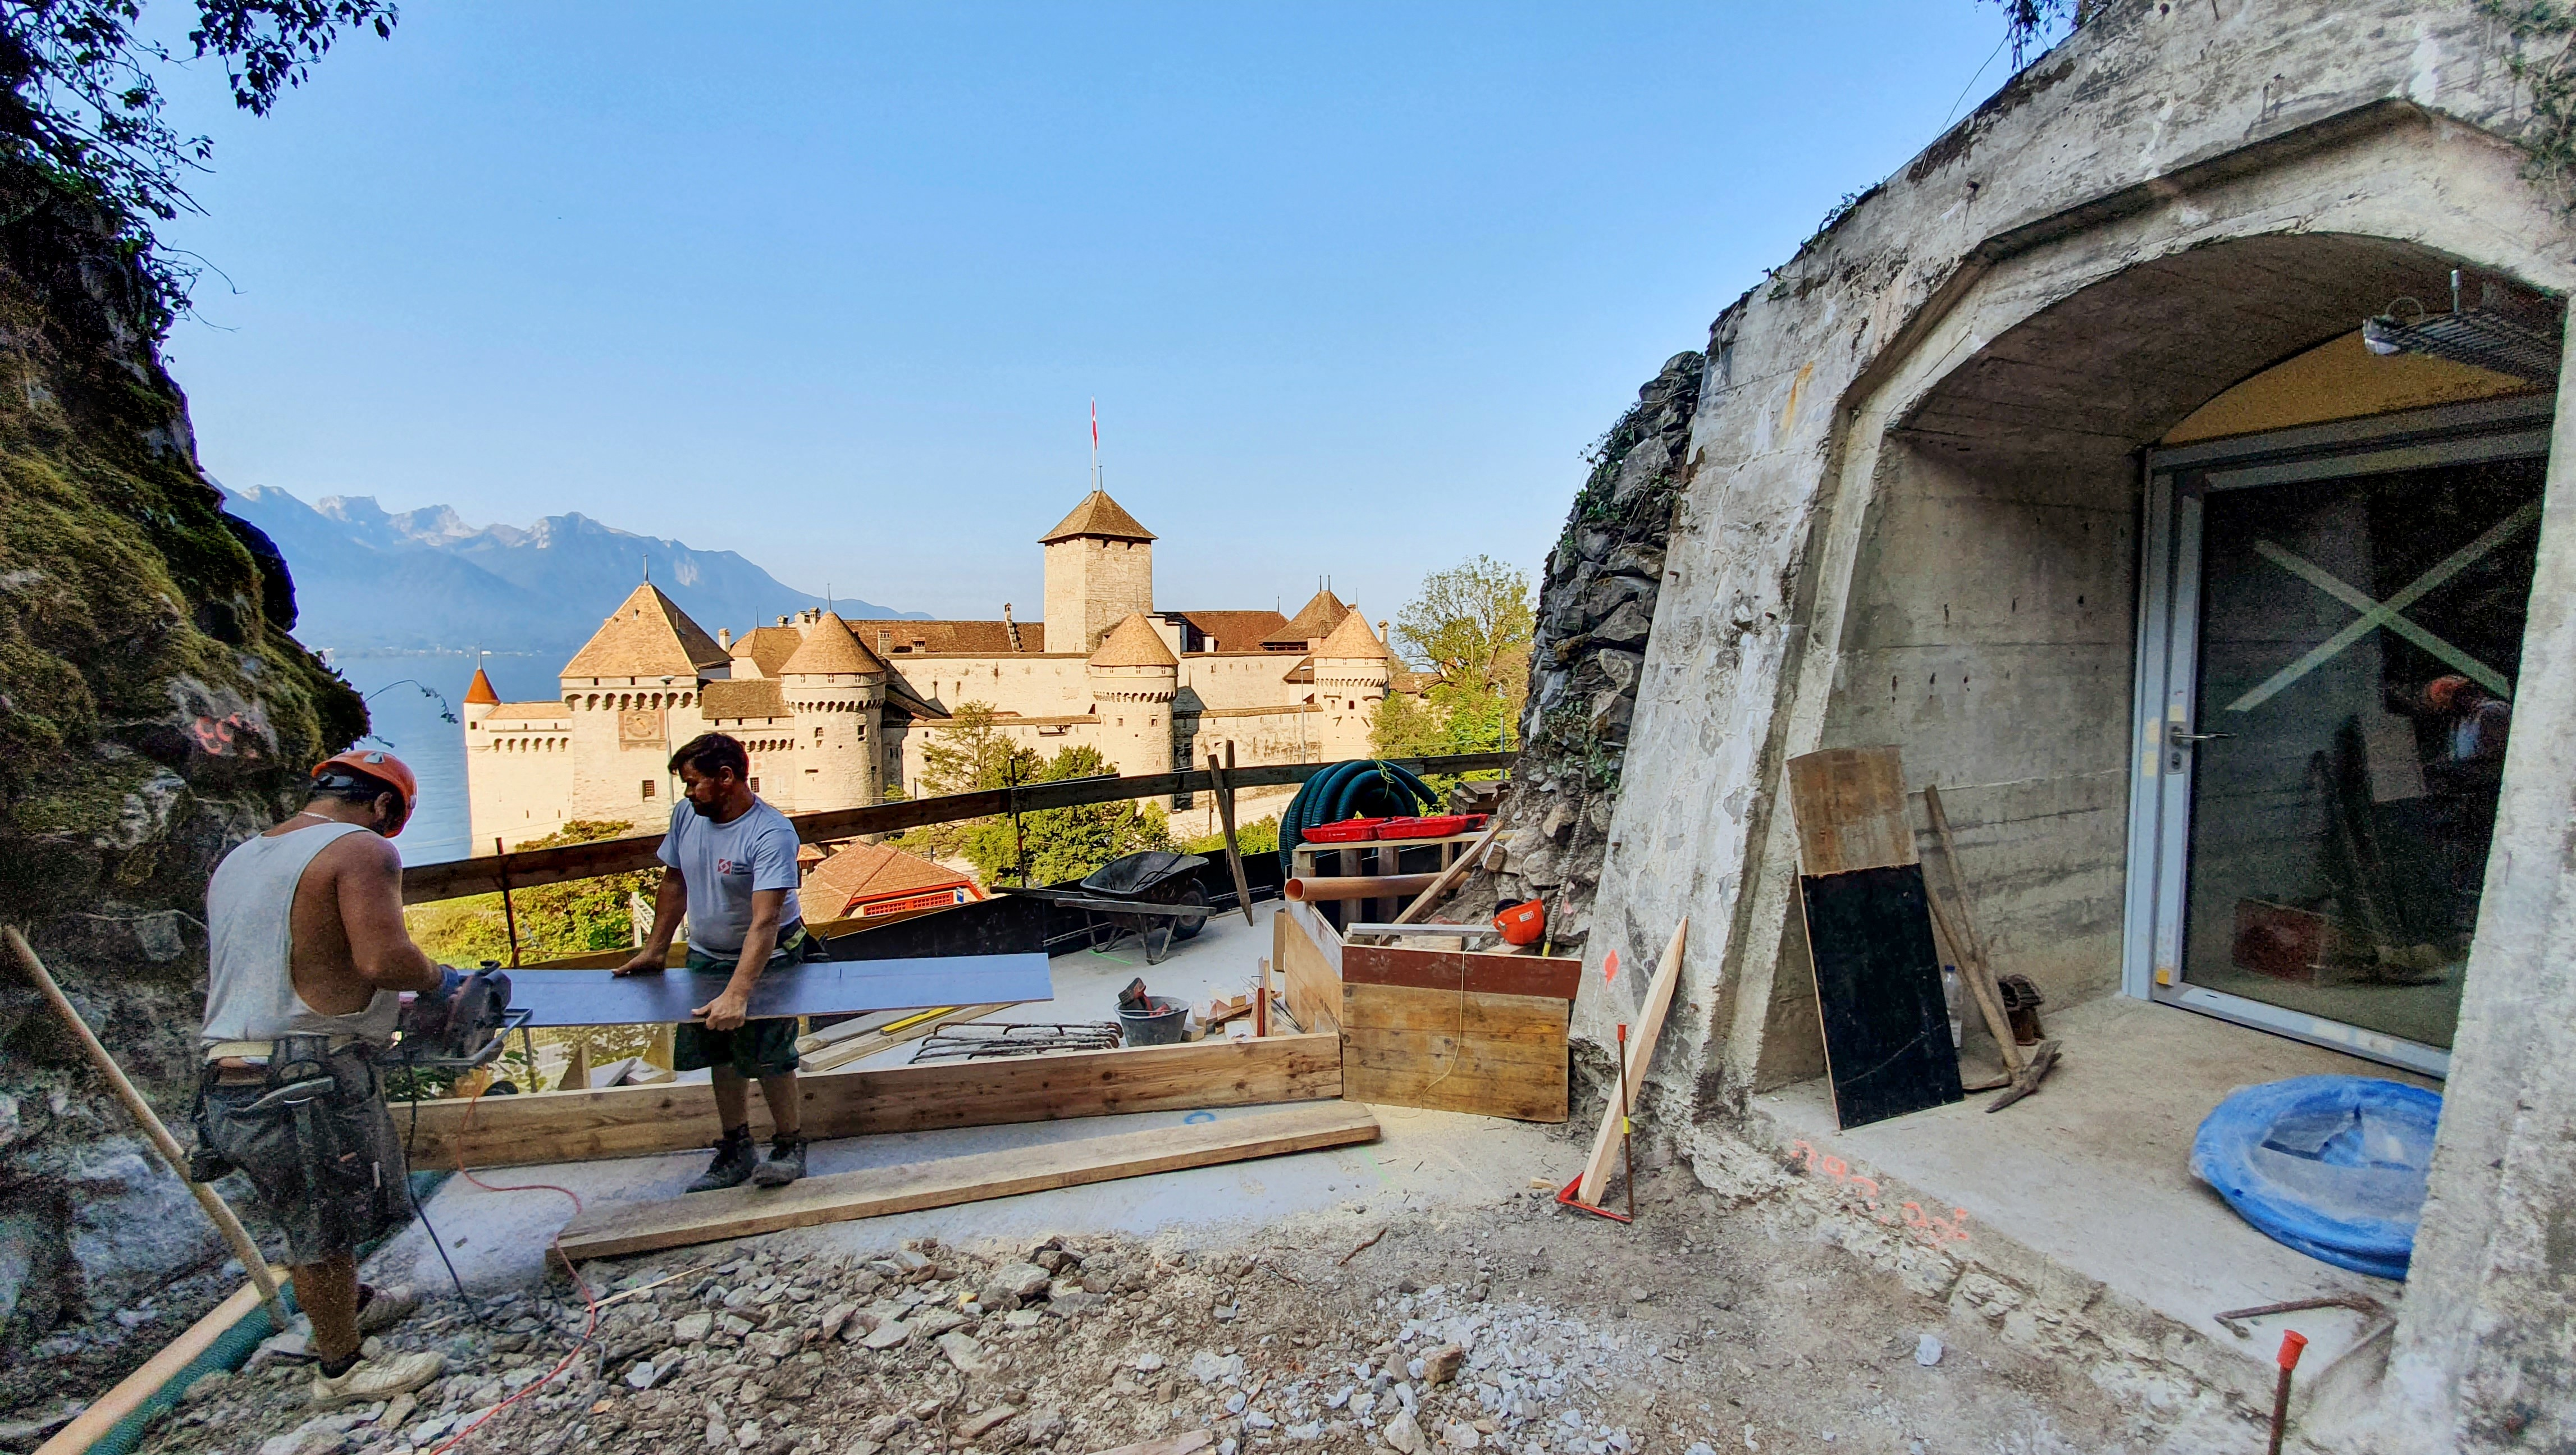 Fort Chillon 1